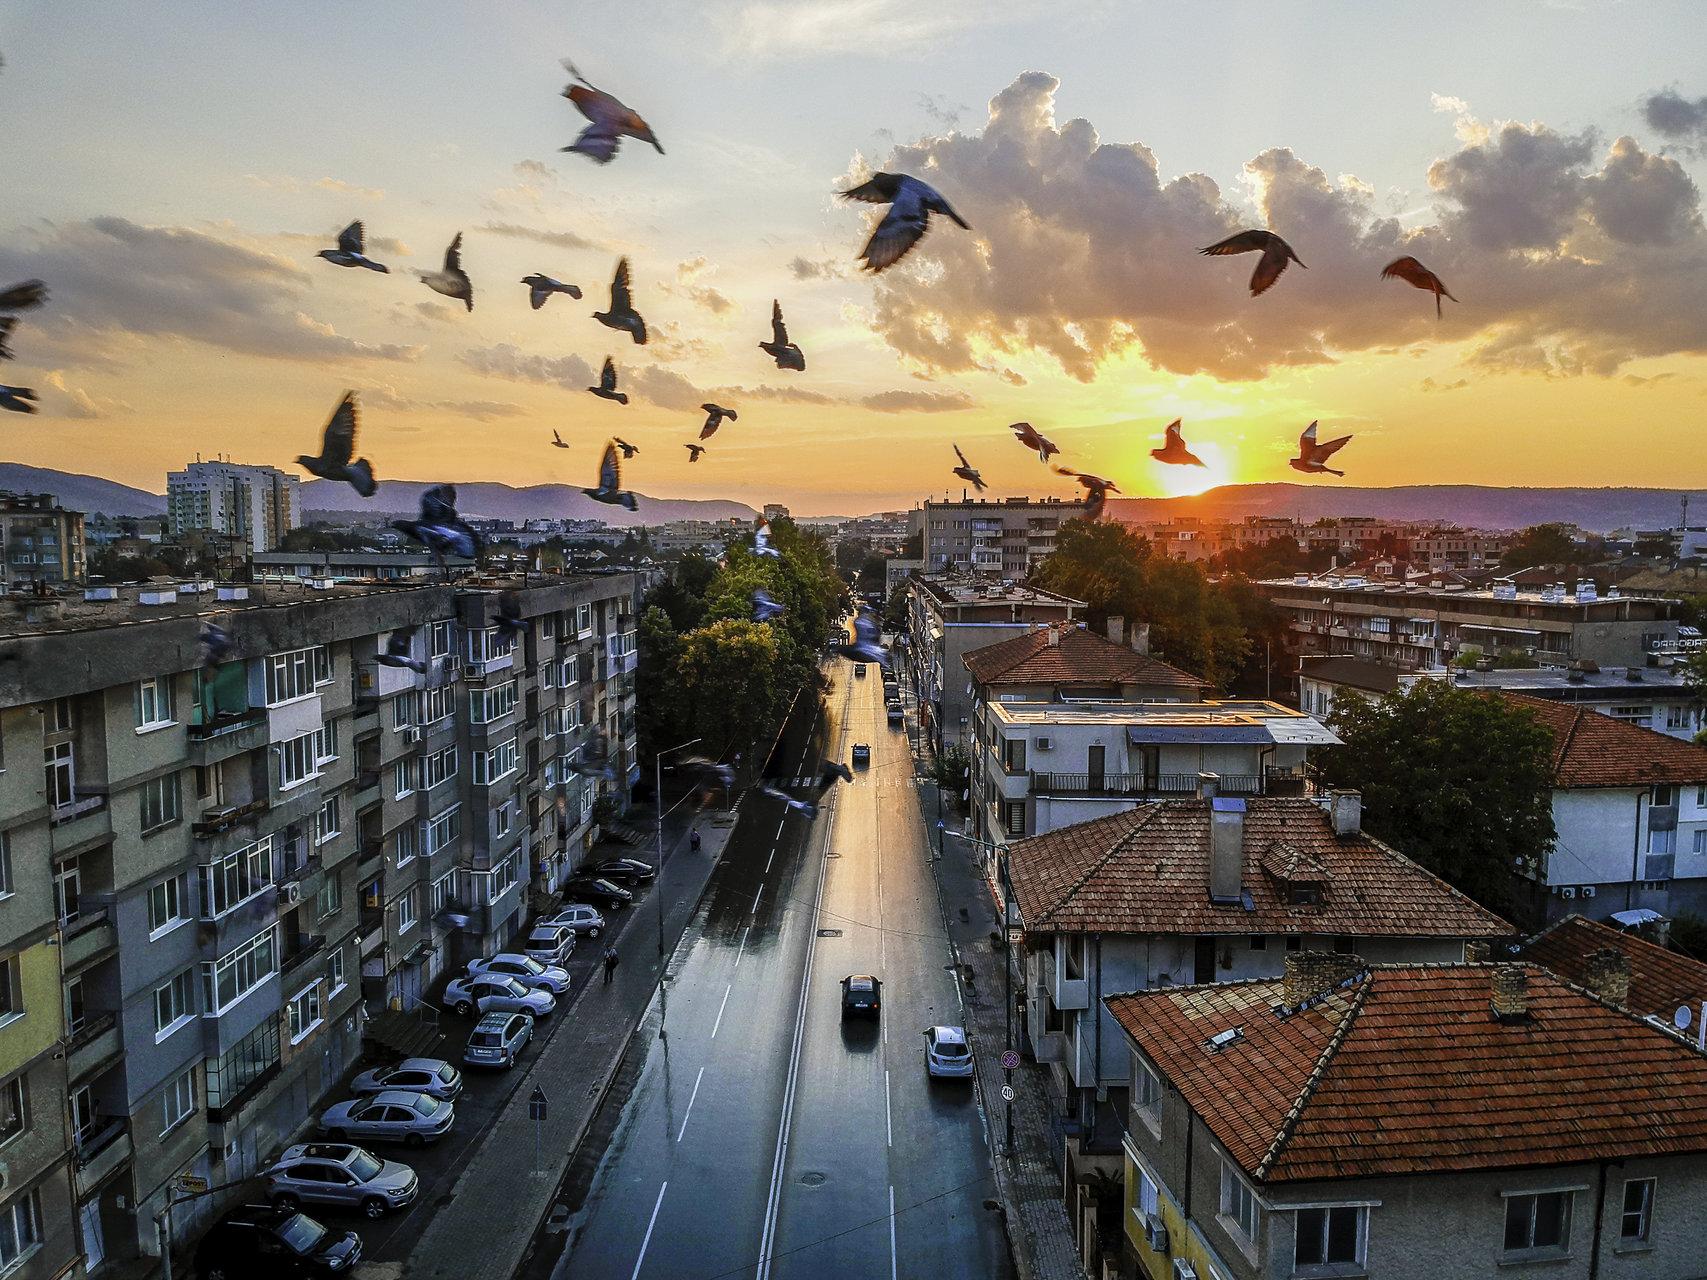 Залезите след дъжд са най-красиви!   Author Vladislav Rusev - vl.rusev   PHOTO FORUM